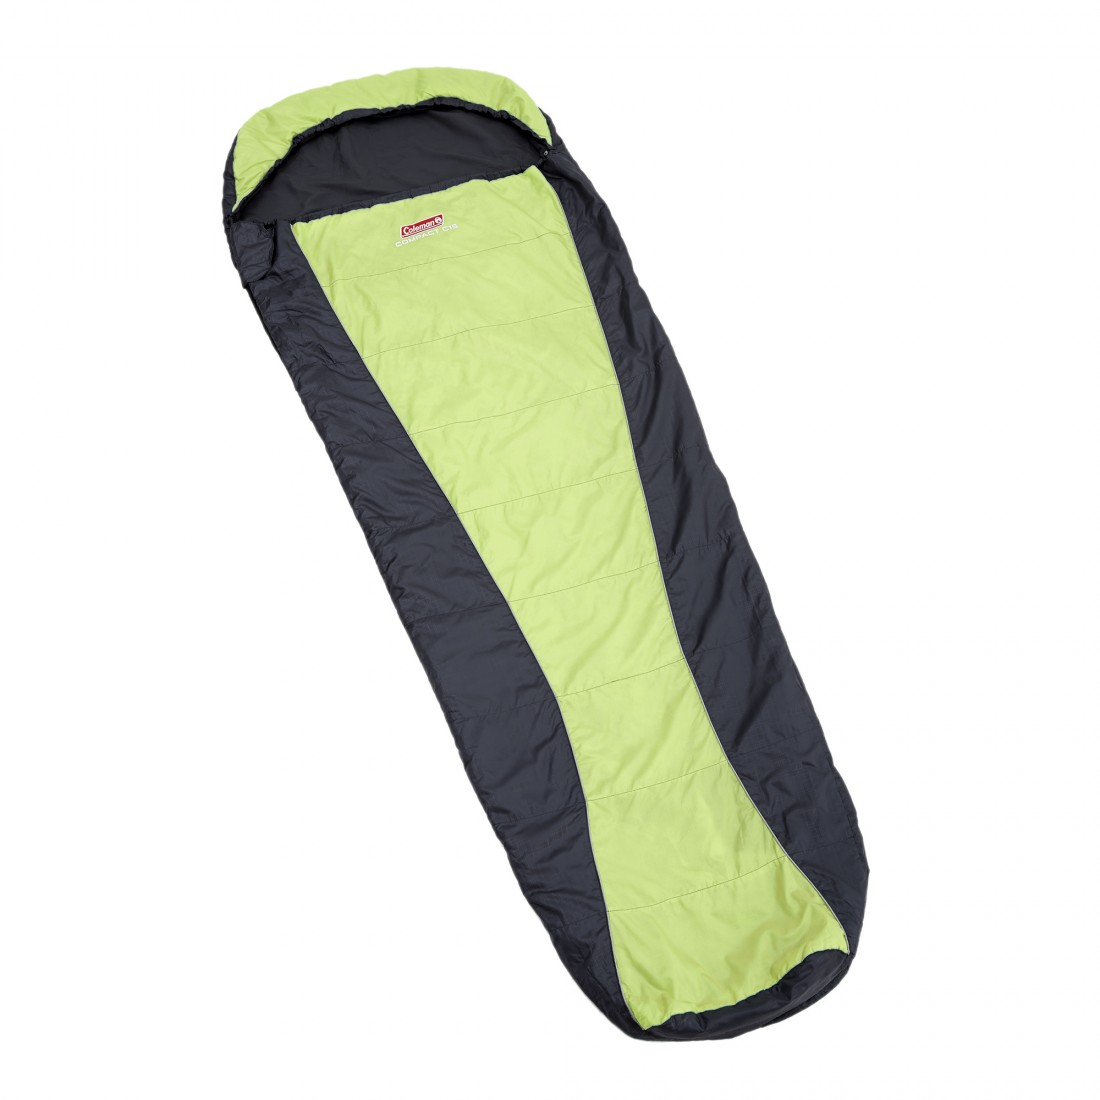 Coleman Compact C15 Sleeping Bag